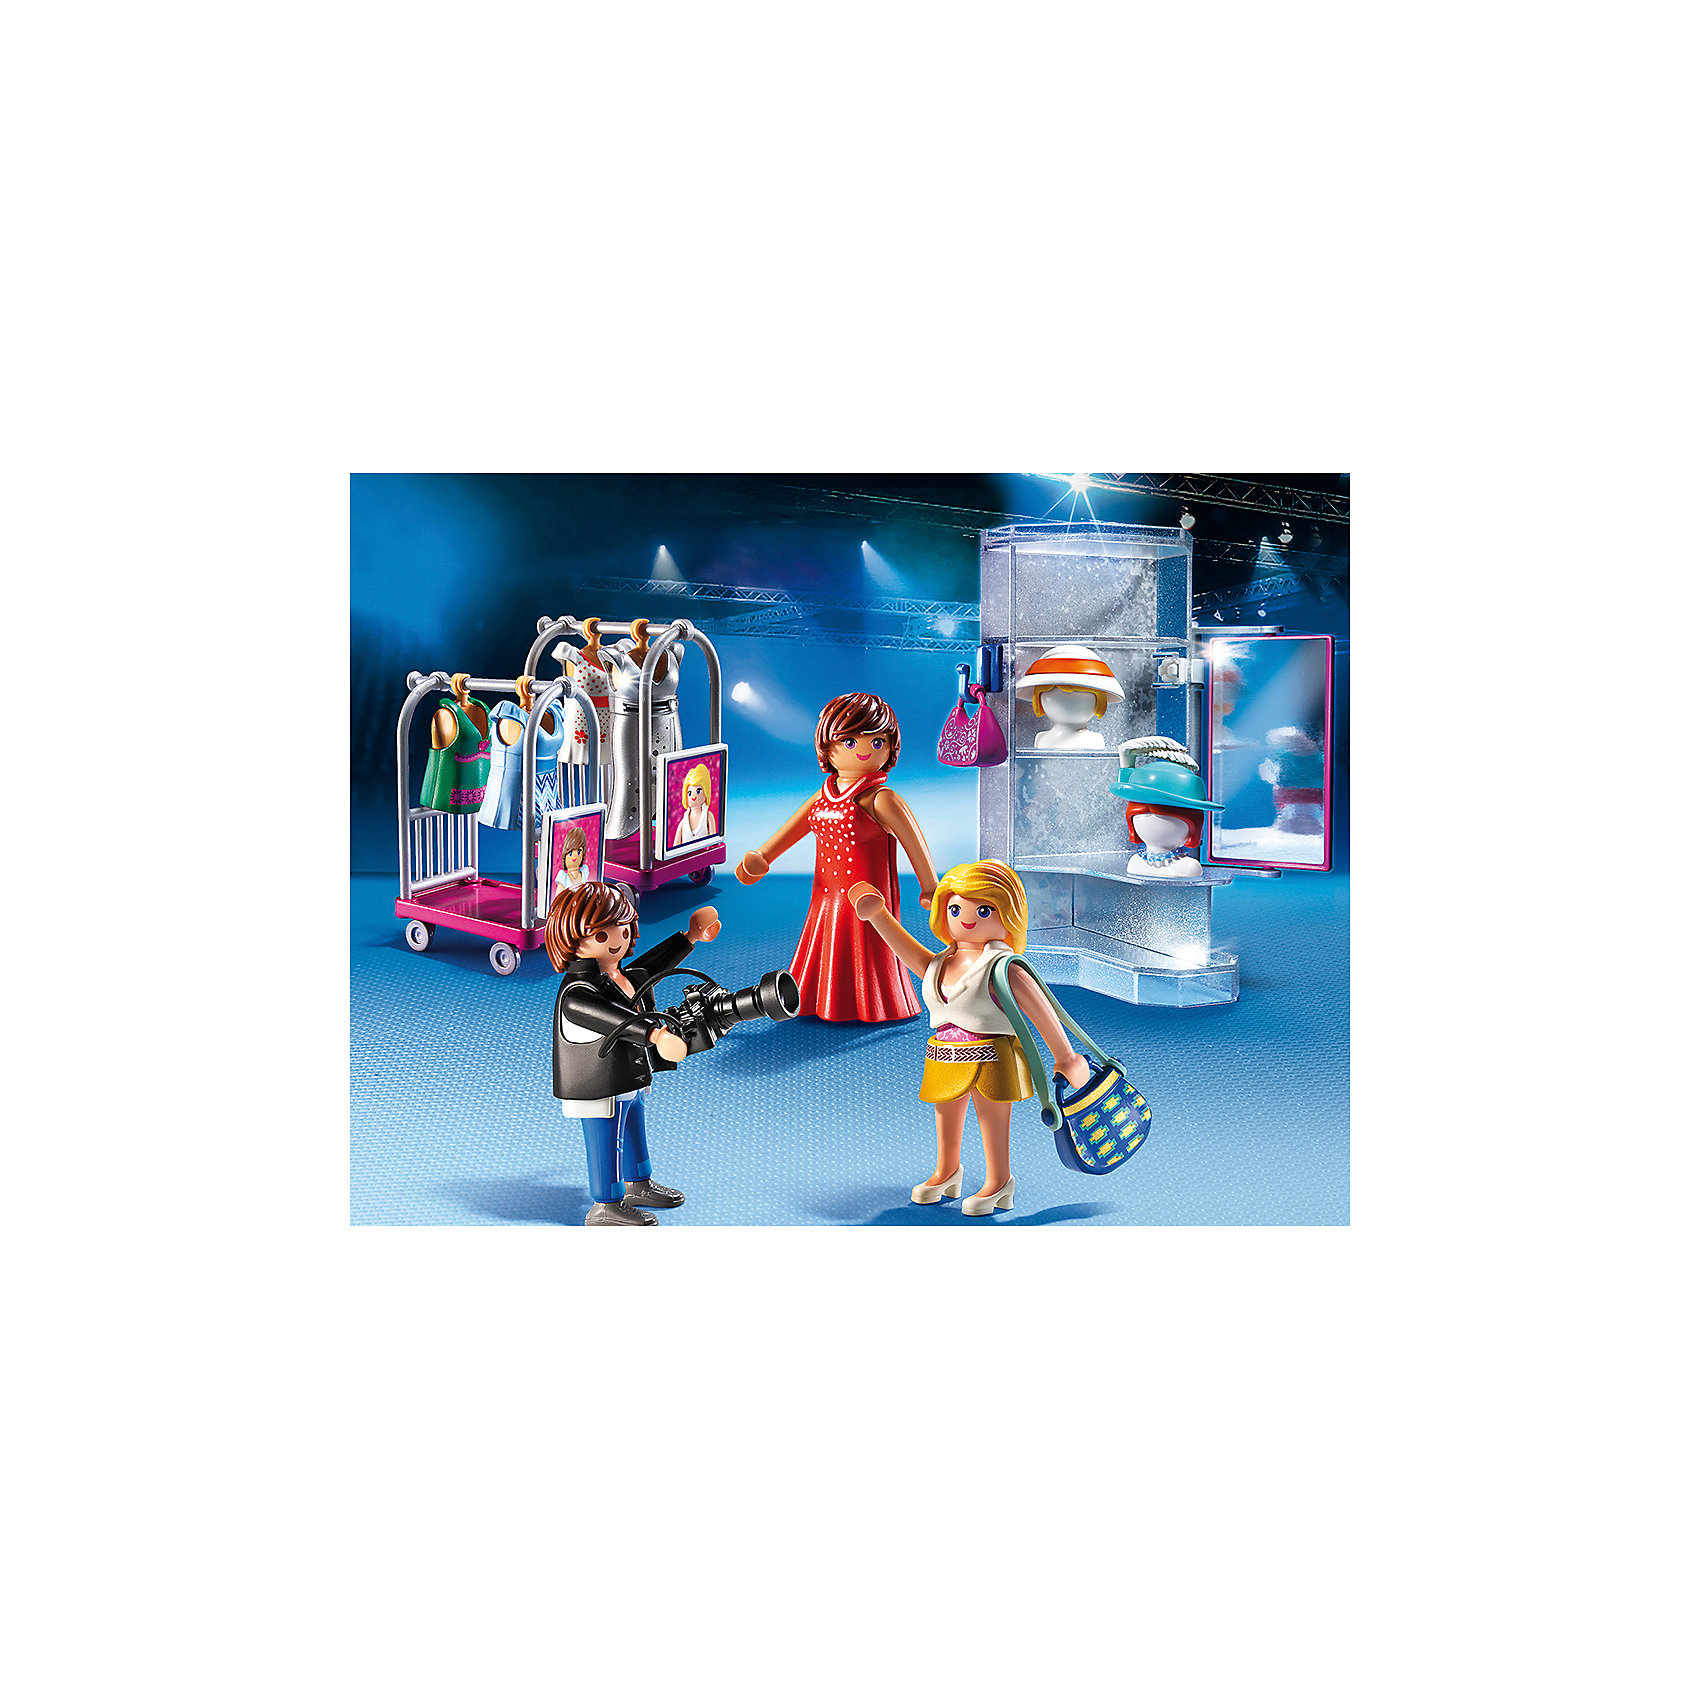 PLAYMOBIL® Фэшн и Стиль: Фотосессия, PLAYMOBIL playmobil® playmobil 5546 парк развлечений продавец шаров smileyworld